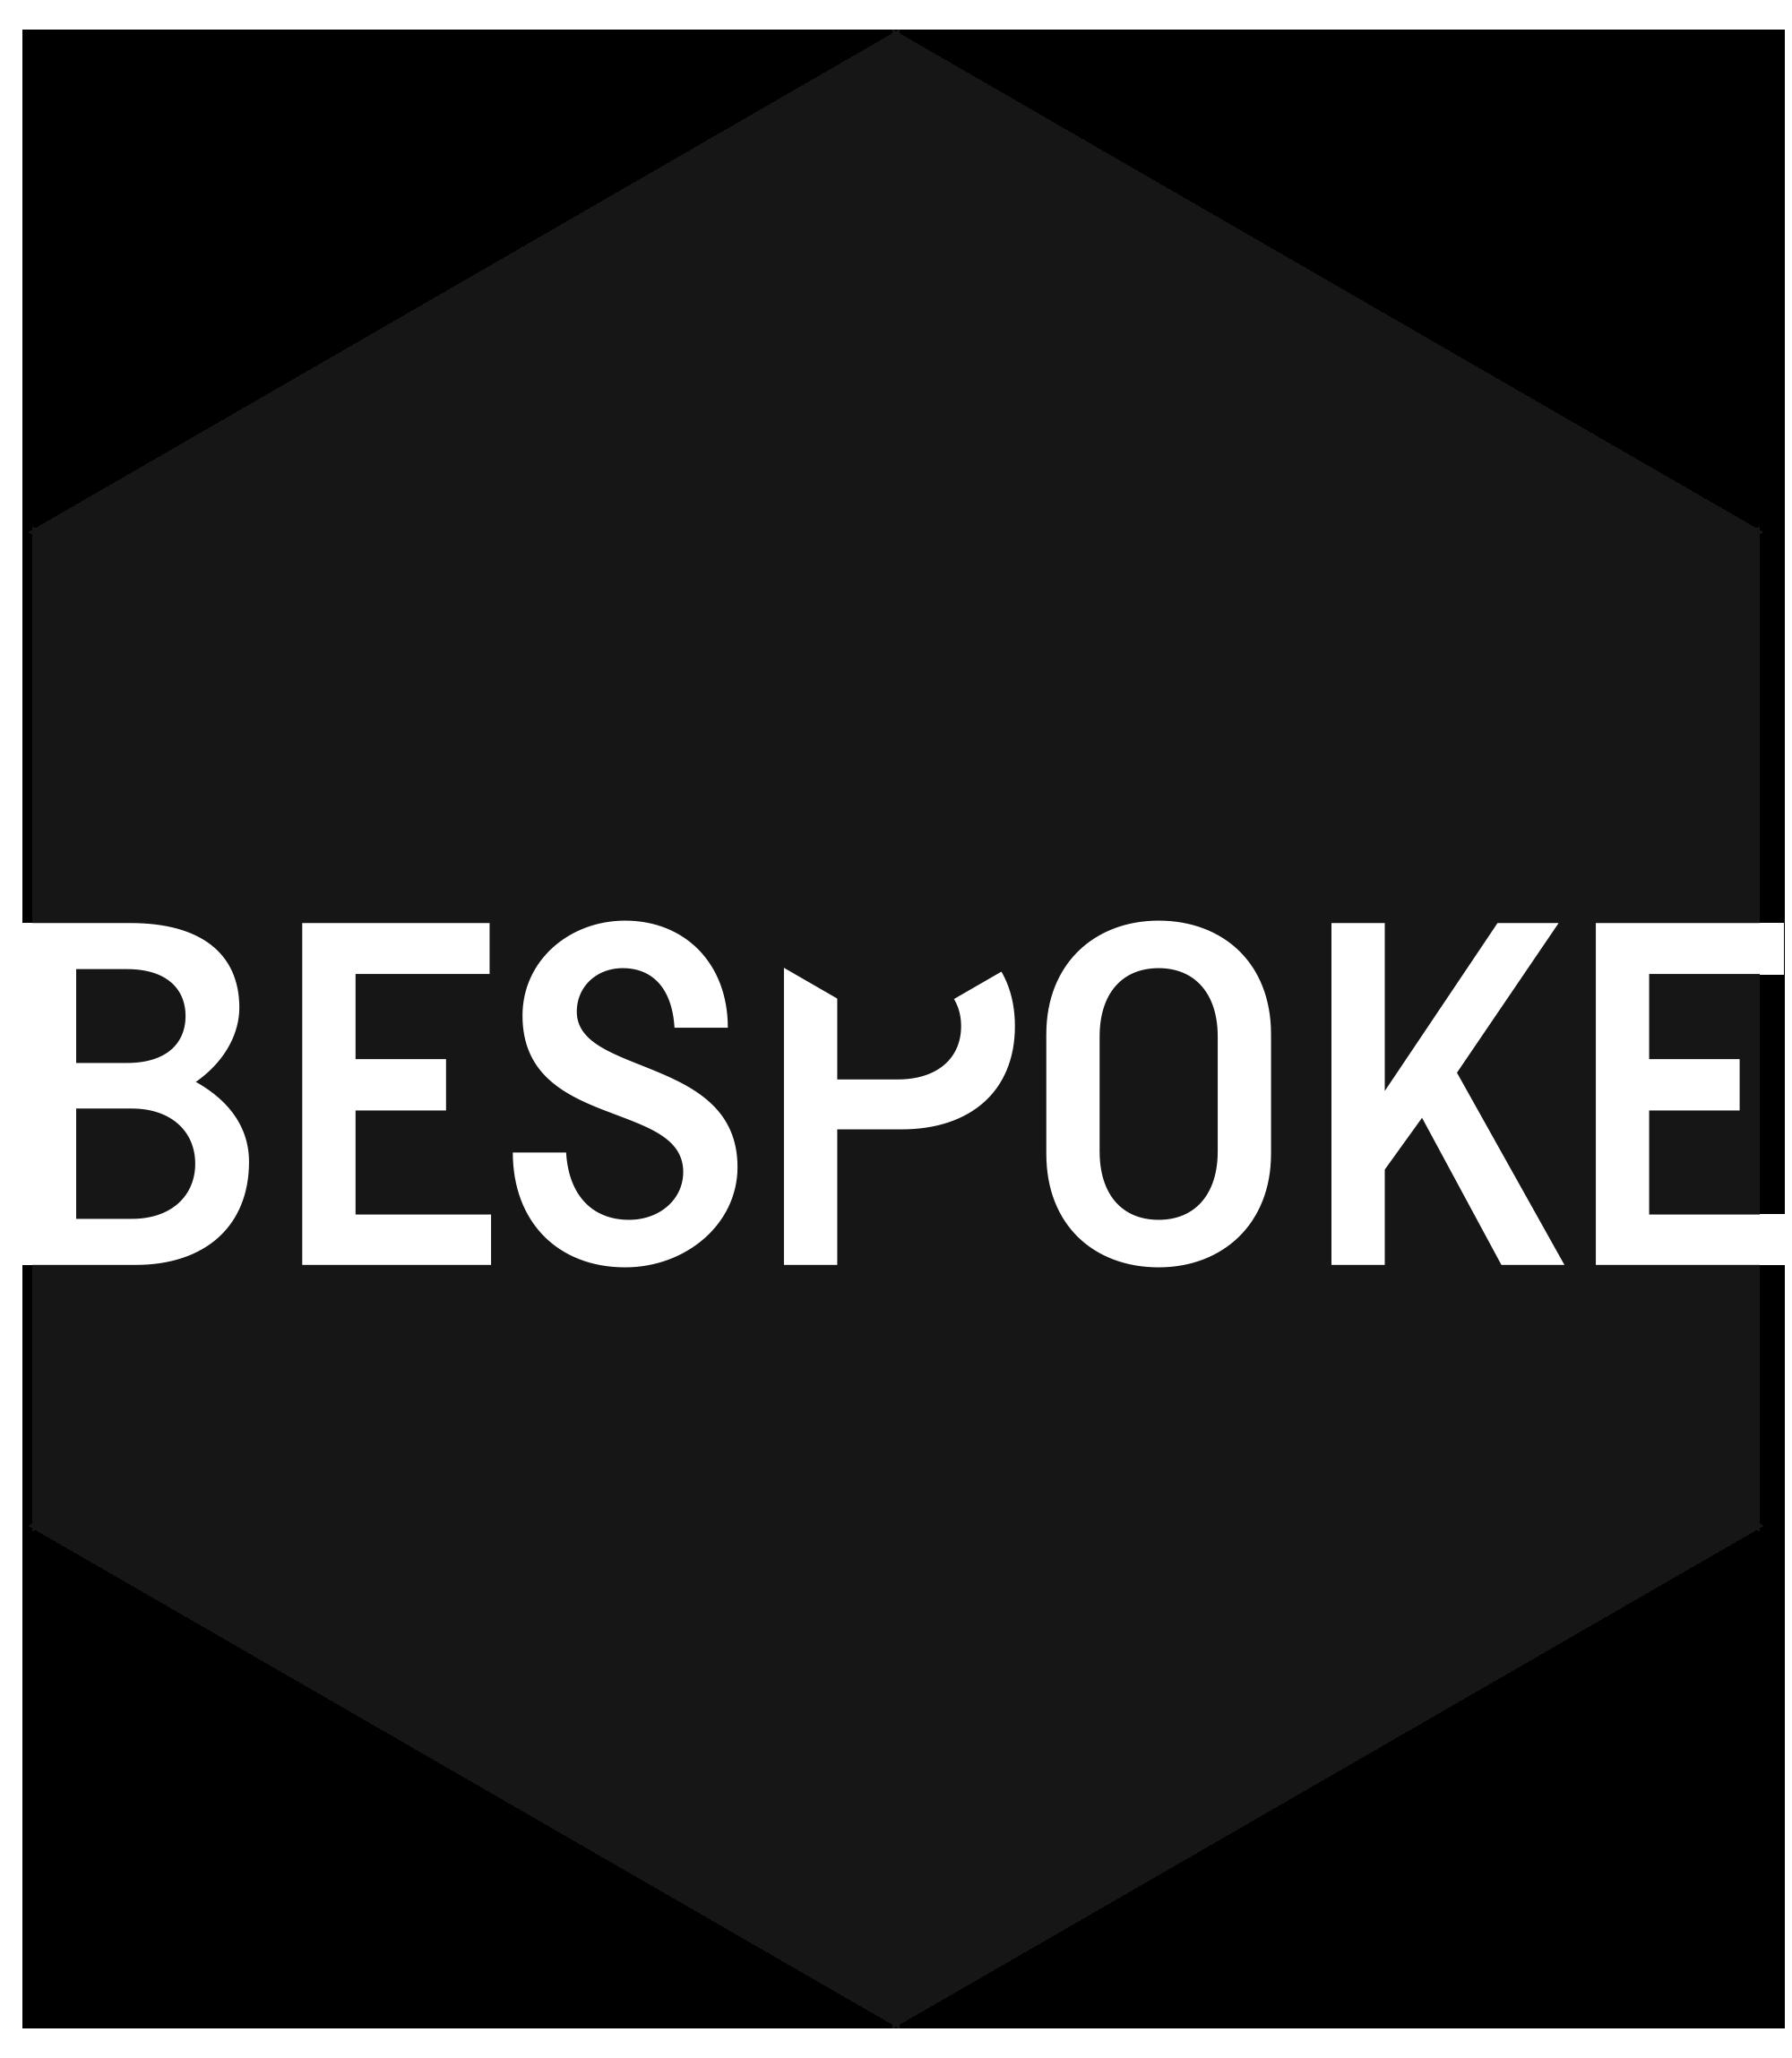 BSPKE Co/work | TheMotoSocialHAMBURG